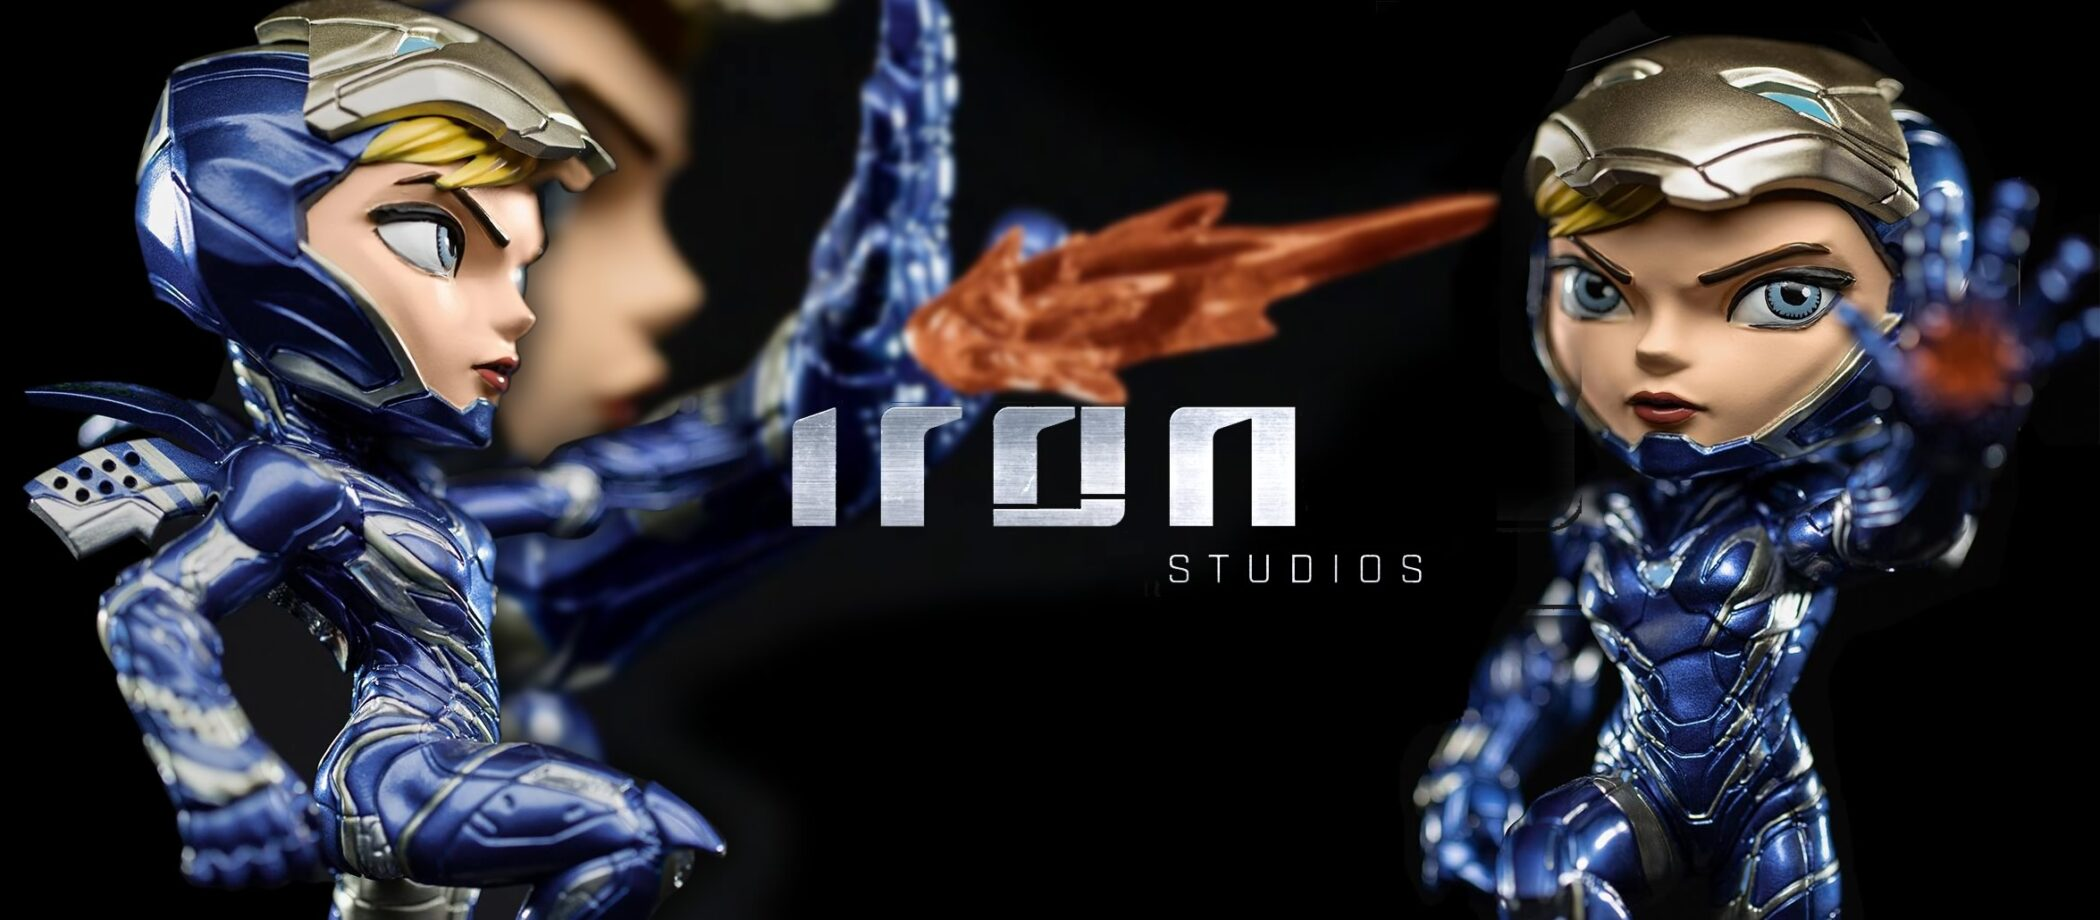 iron studios pepper potts minico scaled - Pepper Potts a Dama de Ferro na versão Minico pela Iron Studios!